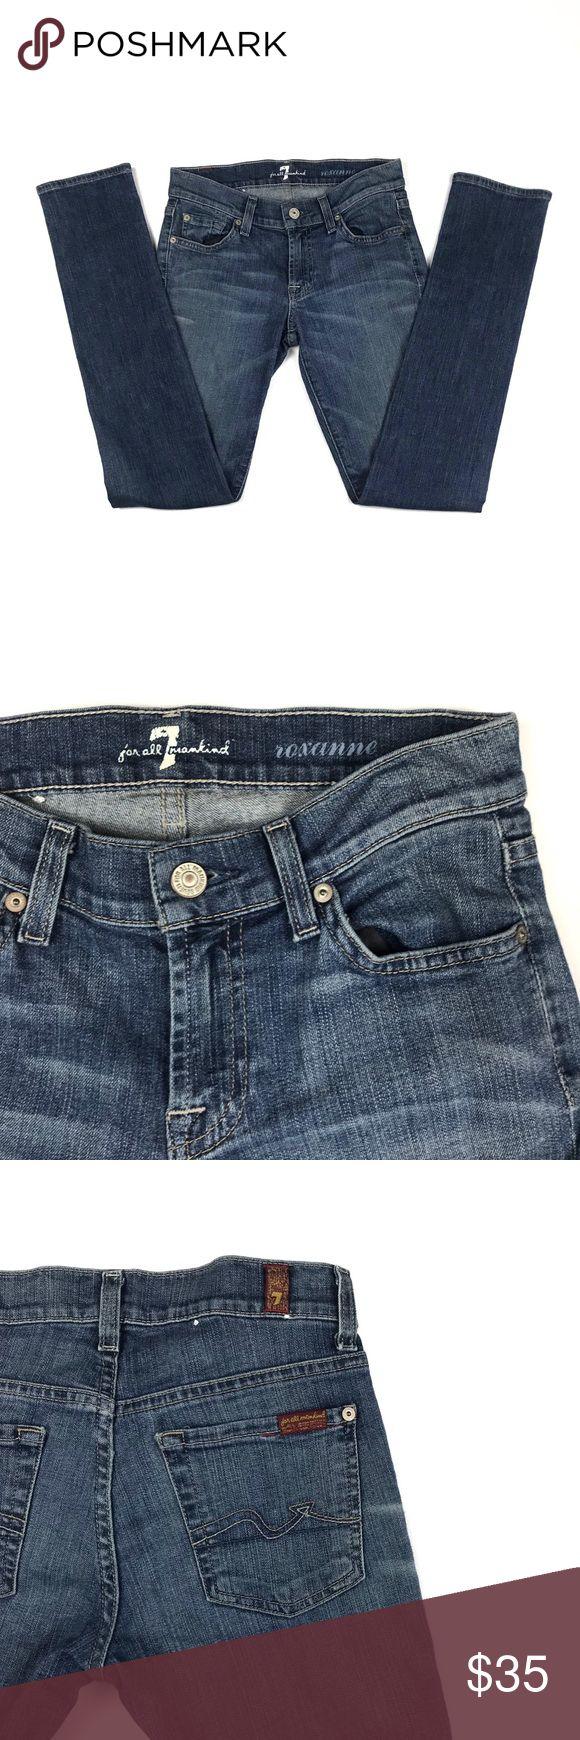 7FAM Roxanne skinny 24 Beautiful 7FAM Roxanne skinny jeans in a size 24 7 For All Mankind Jeans Skinny